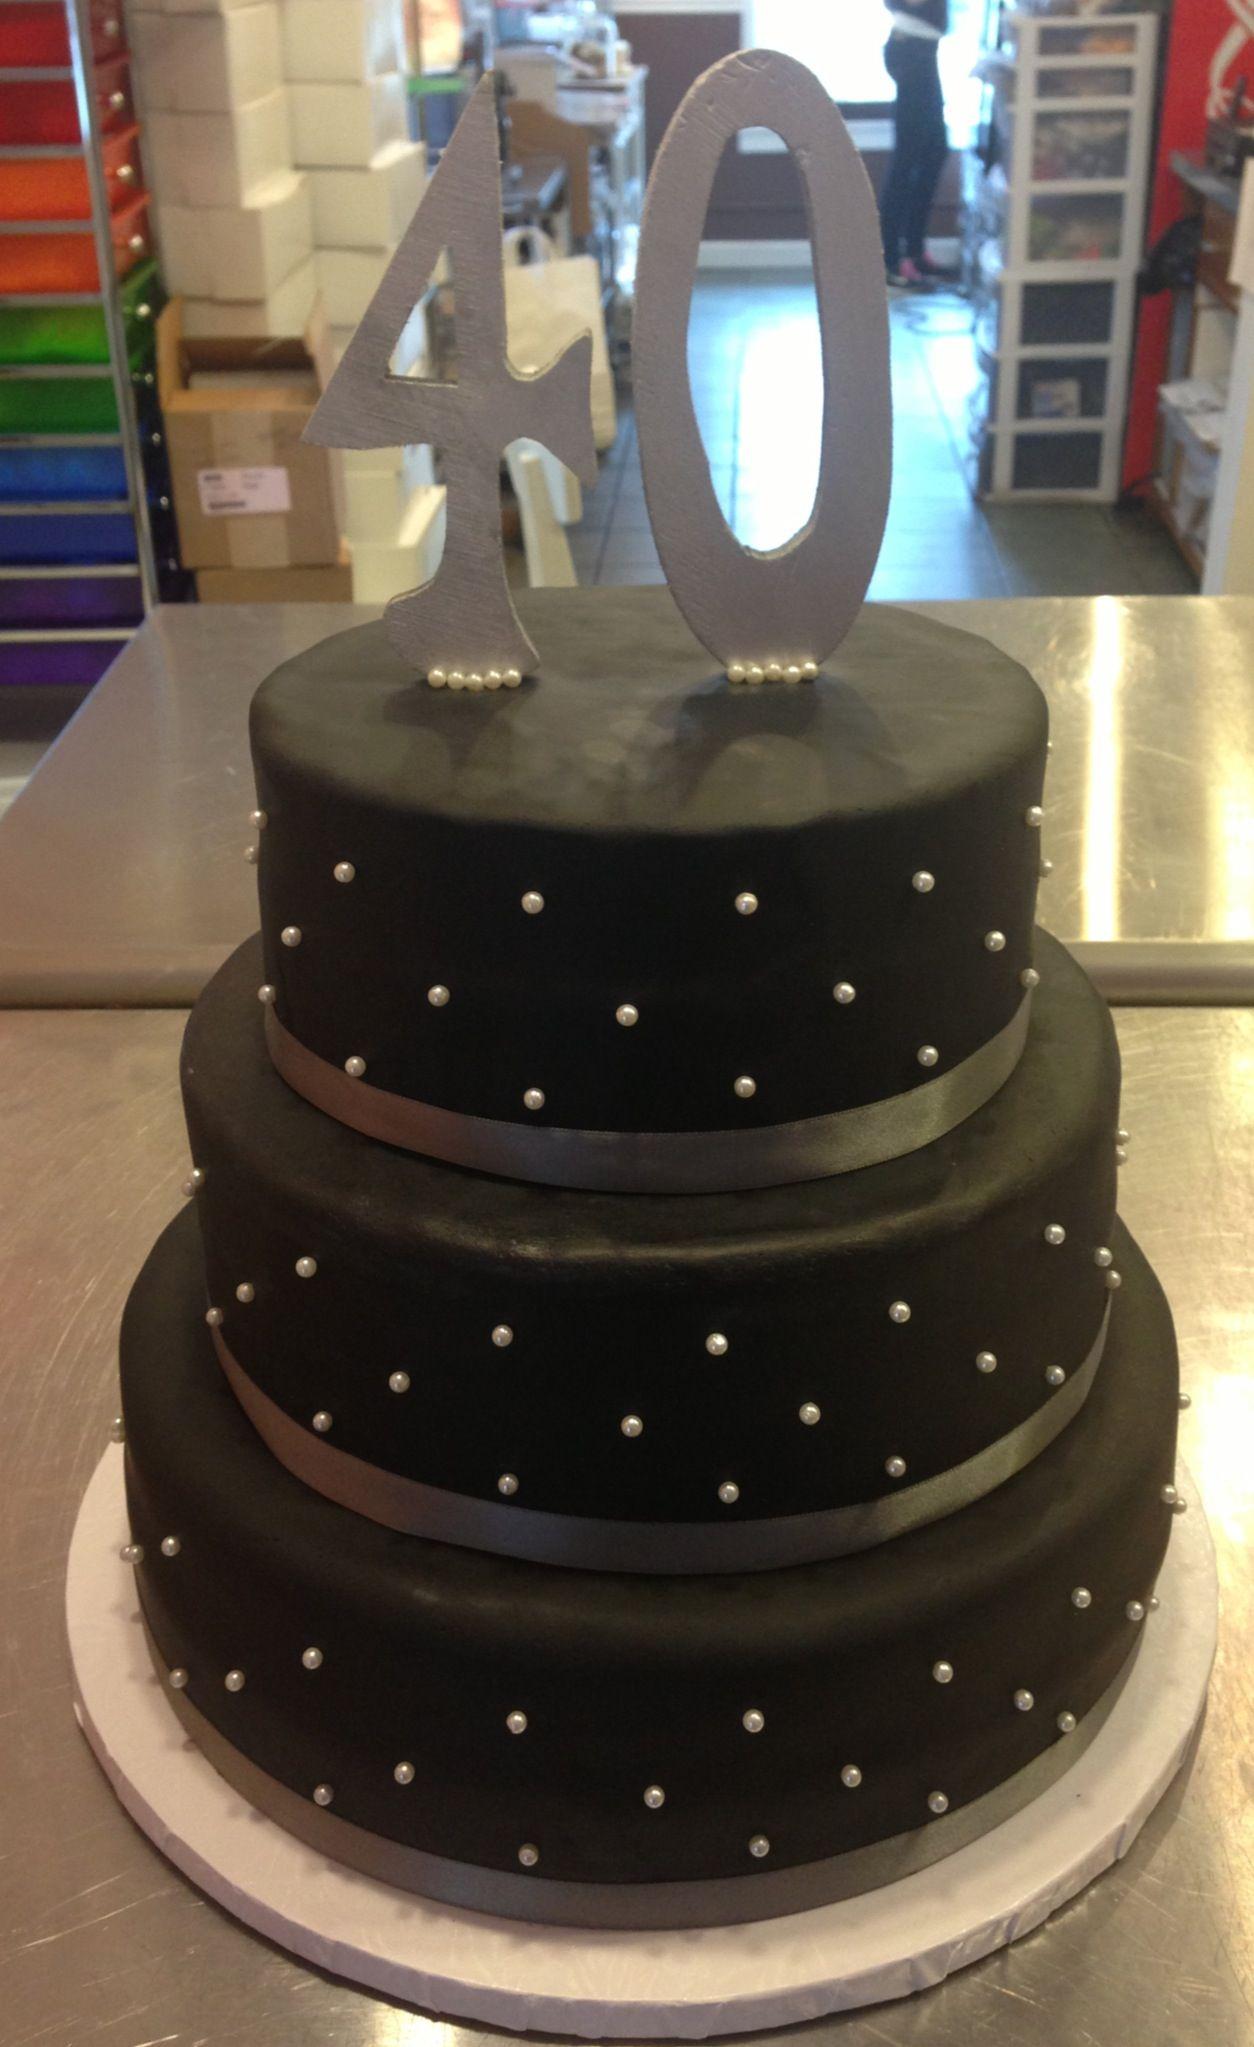 40th Birthday Cake Simple Cake Idea 40th Birthday Cakes 40th